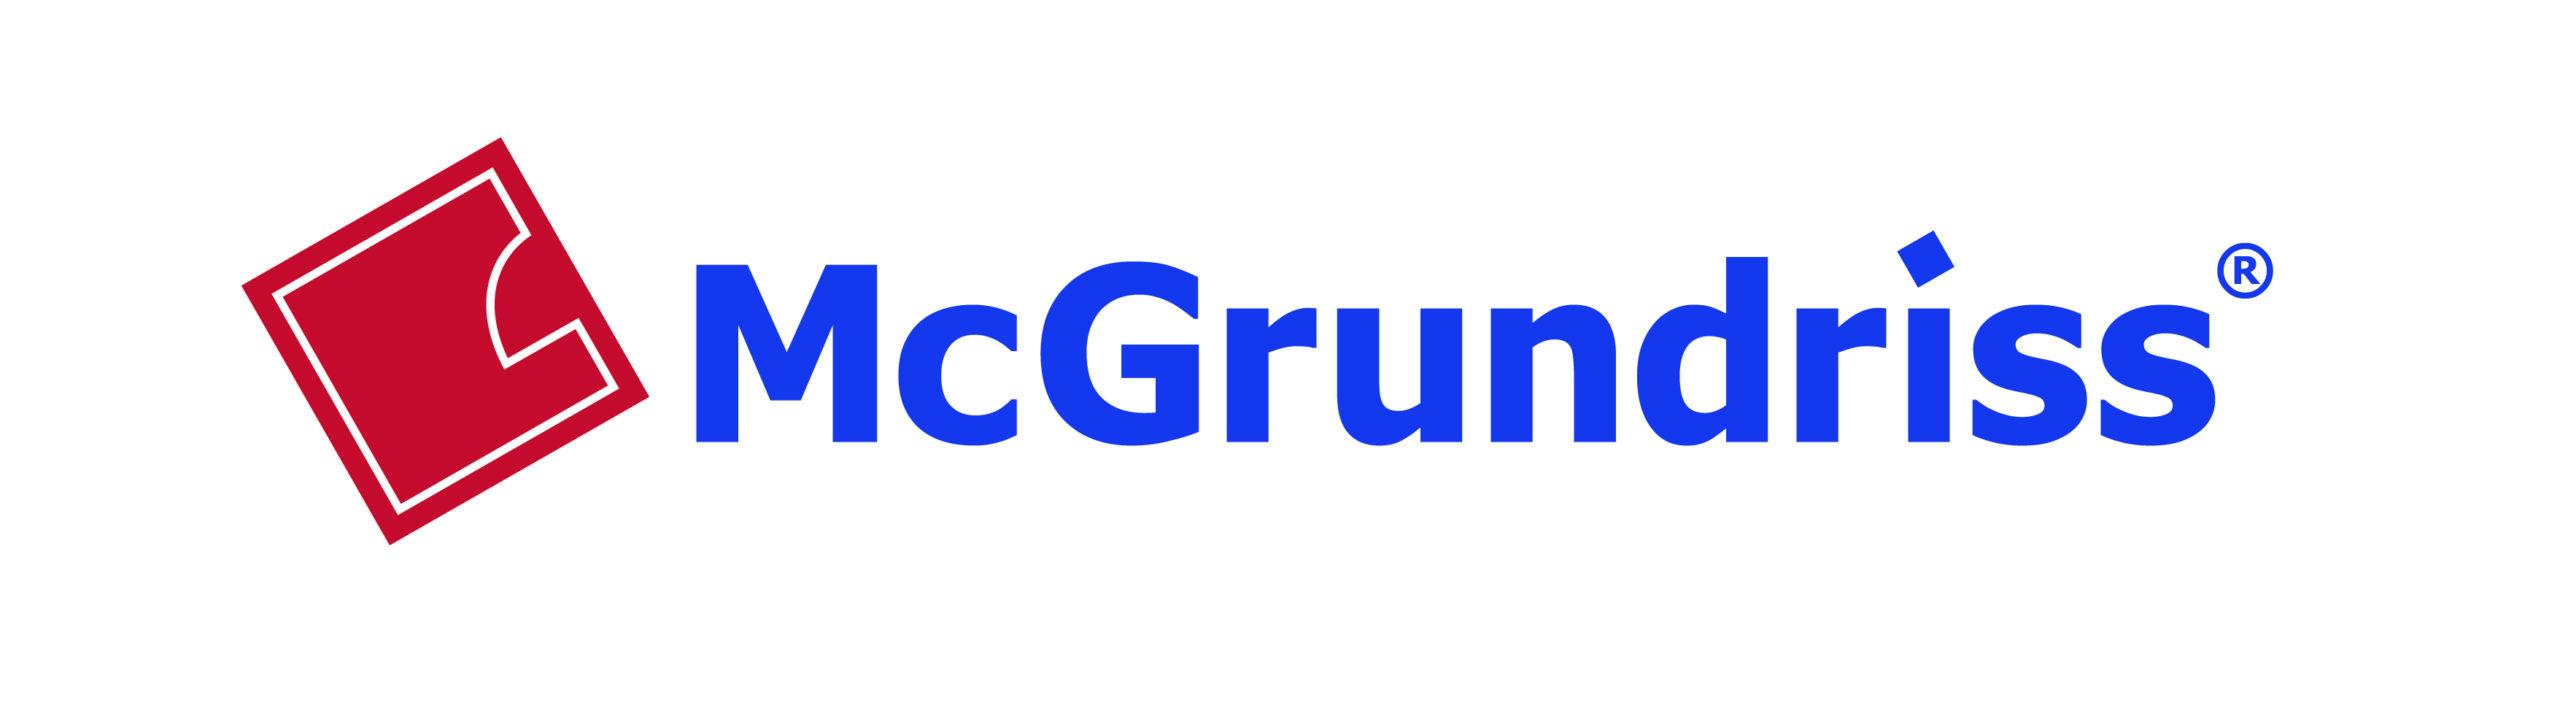 McGrundriss GmbH & Co.KG